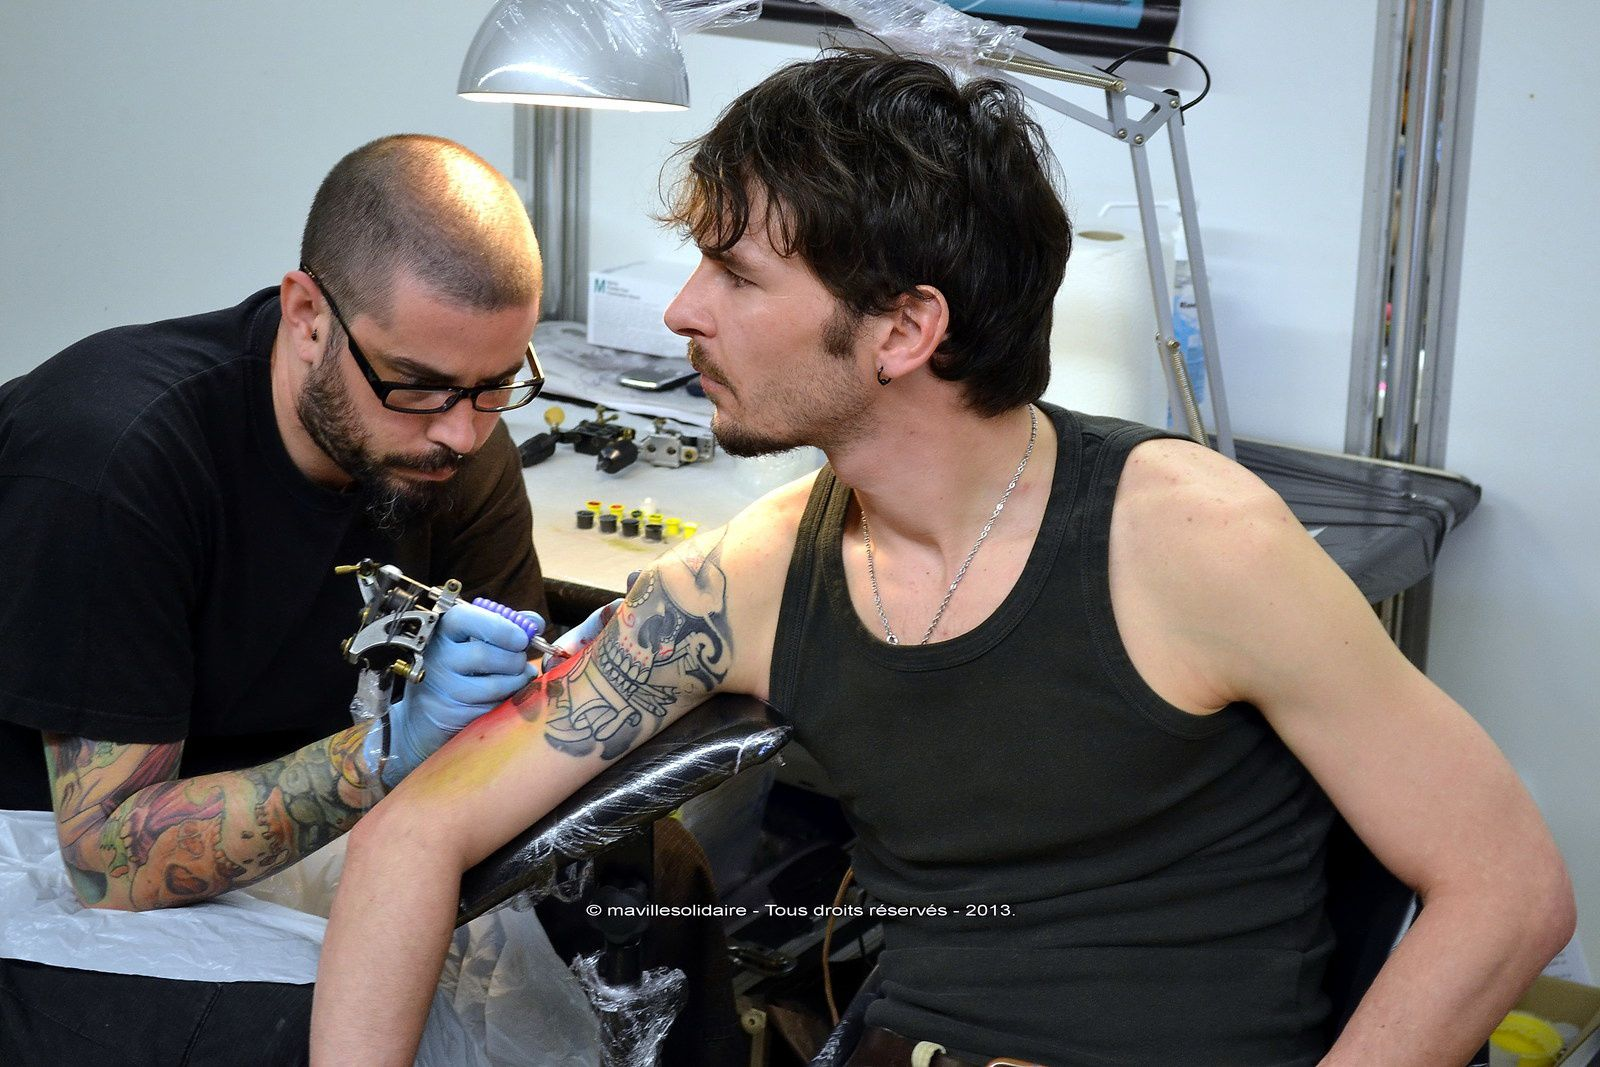 La Roche-sur-Yon: 6e convention tatouage le samedi 26 et dimanche 27 avril 2014.